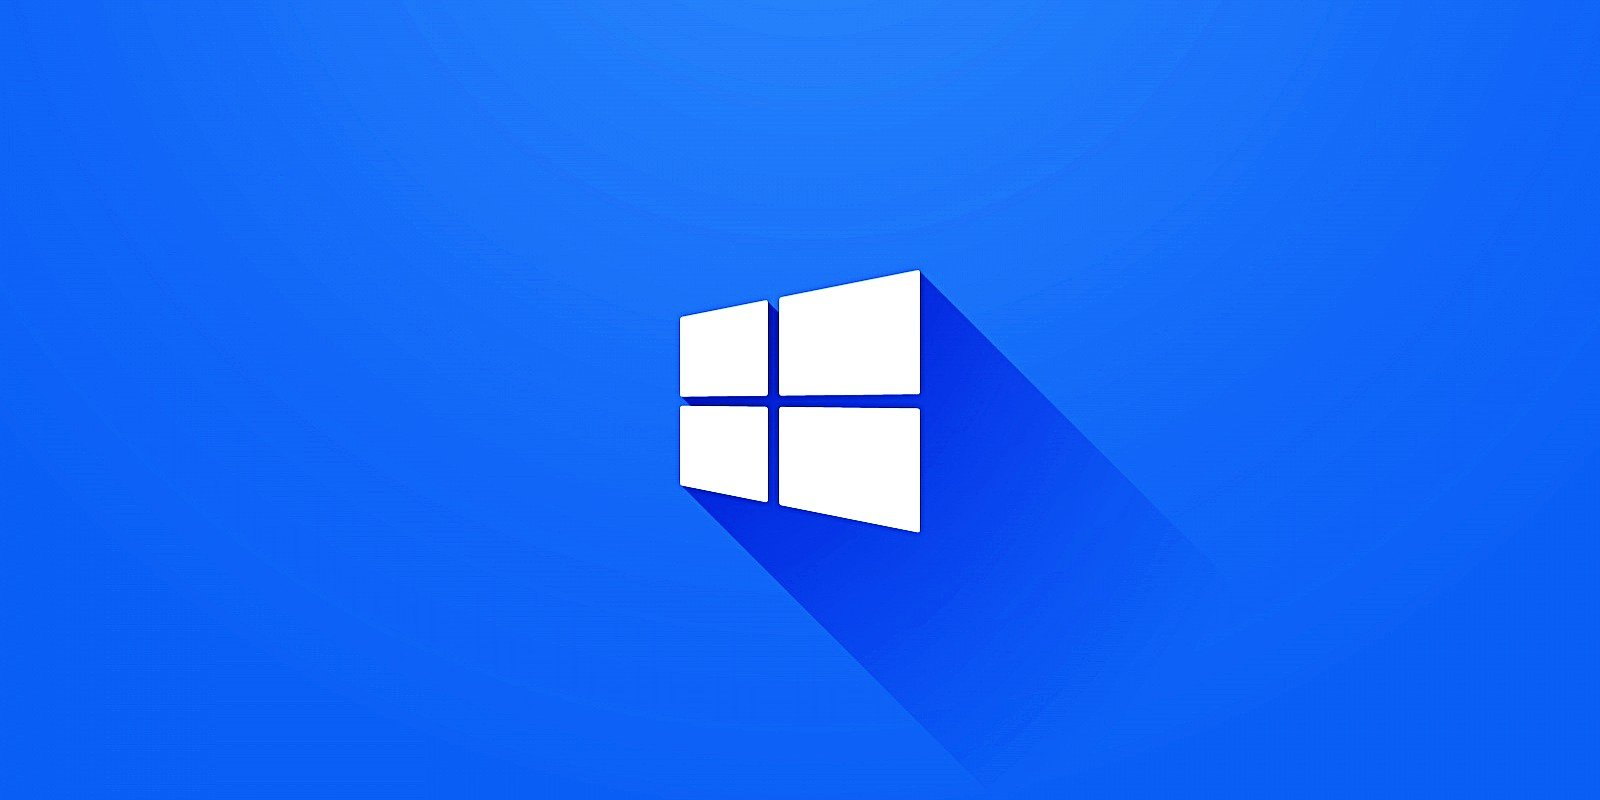 Microsoft Releases KB4580364 Update To Fix Windows 10 Freezes